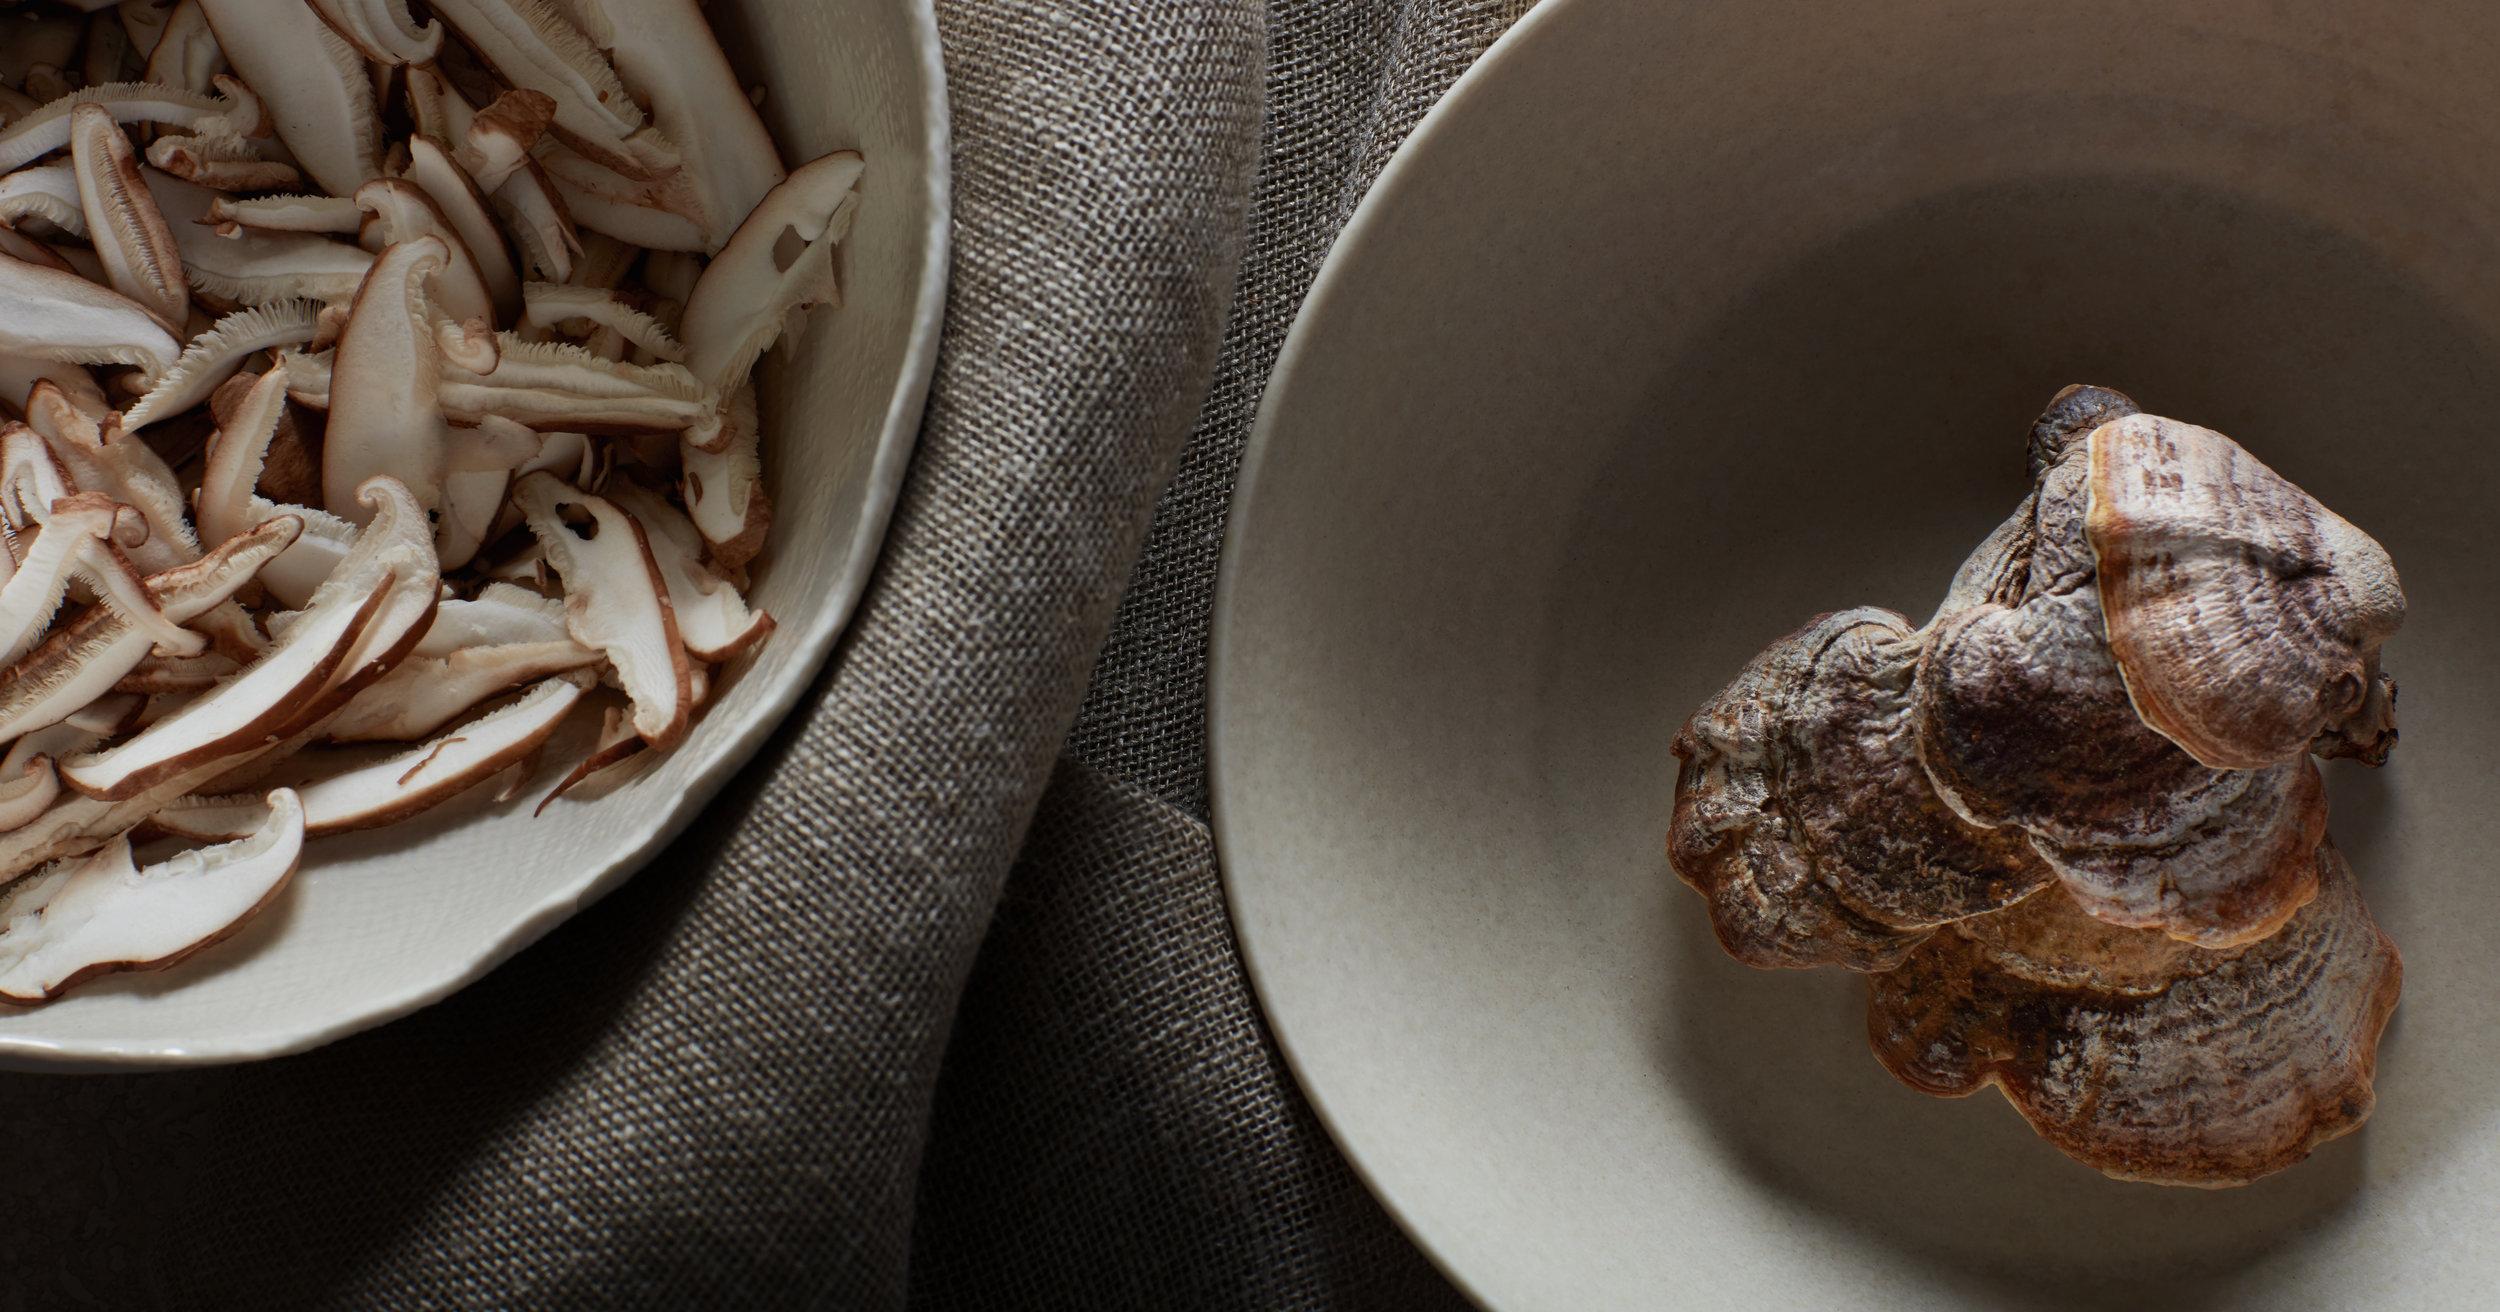 bt_journal_mushroom-coffee_01.jpg